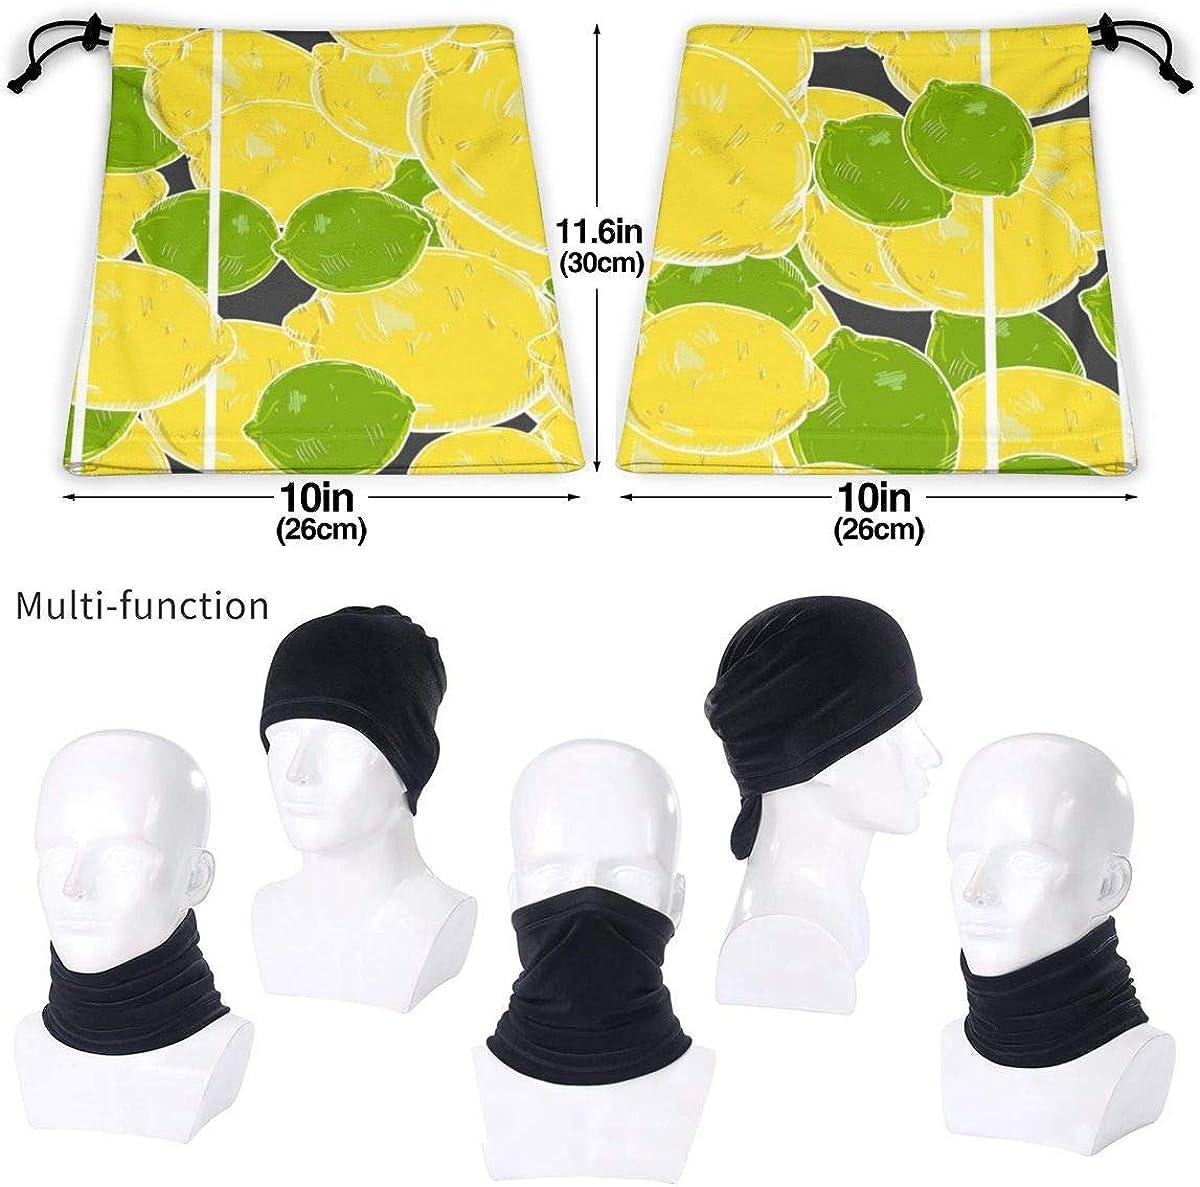 SLHFPX Neck Gaiter Face Mask Vector Lemons And Limes Half Balaclava Ski Masks for Women Men Adult